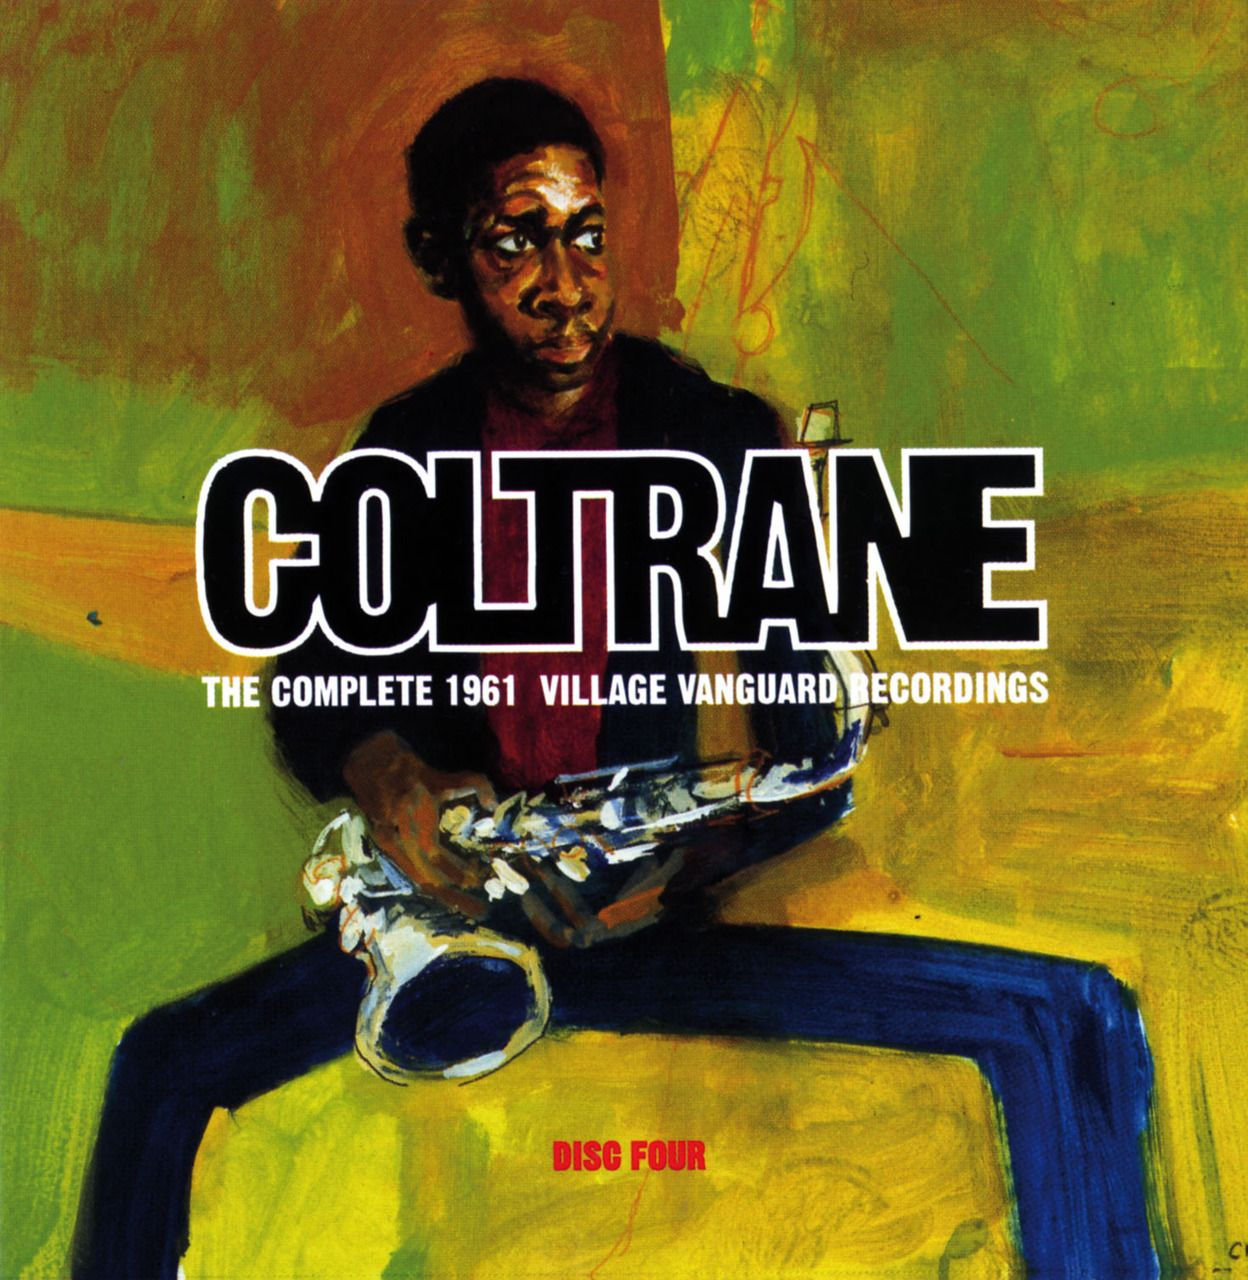 Pin on John Coltrane and Elvin Jones